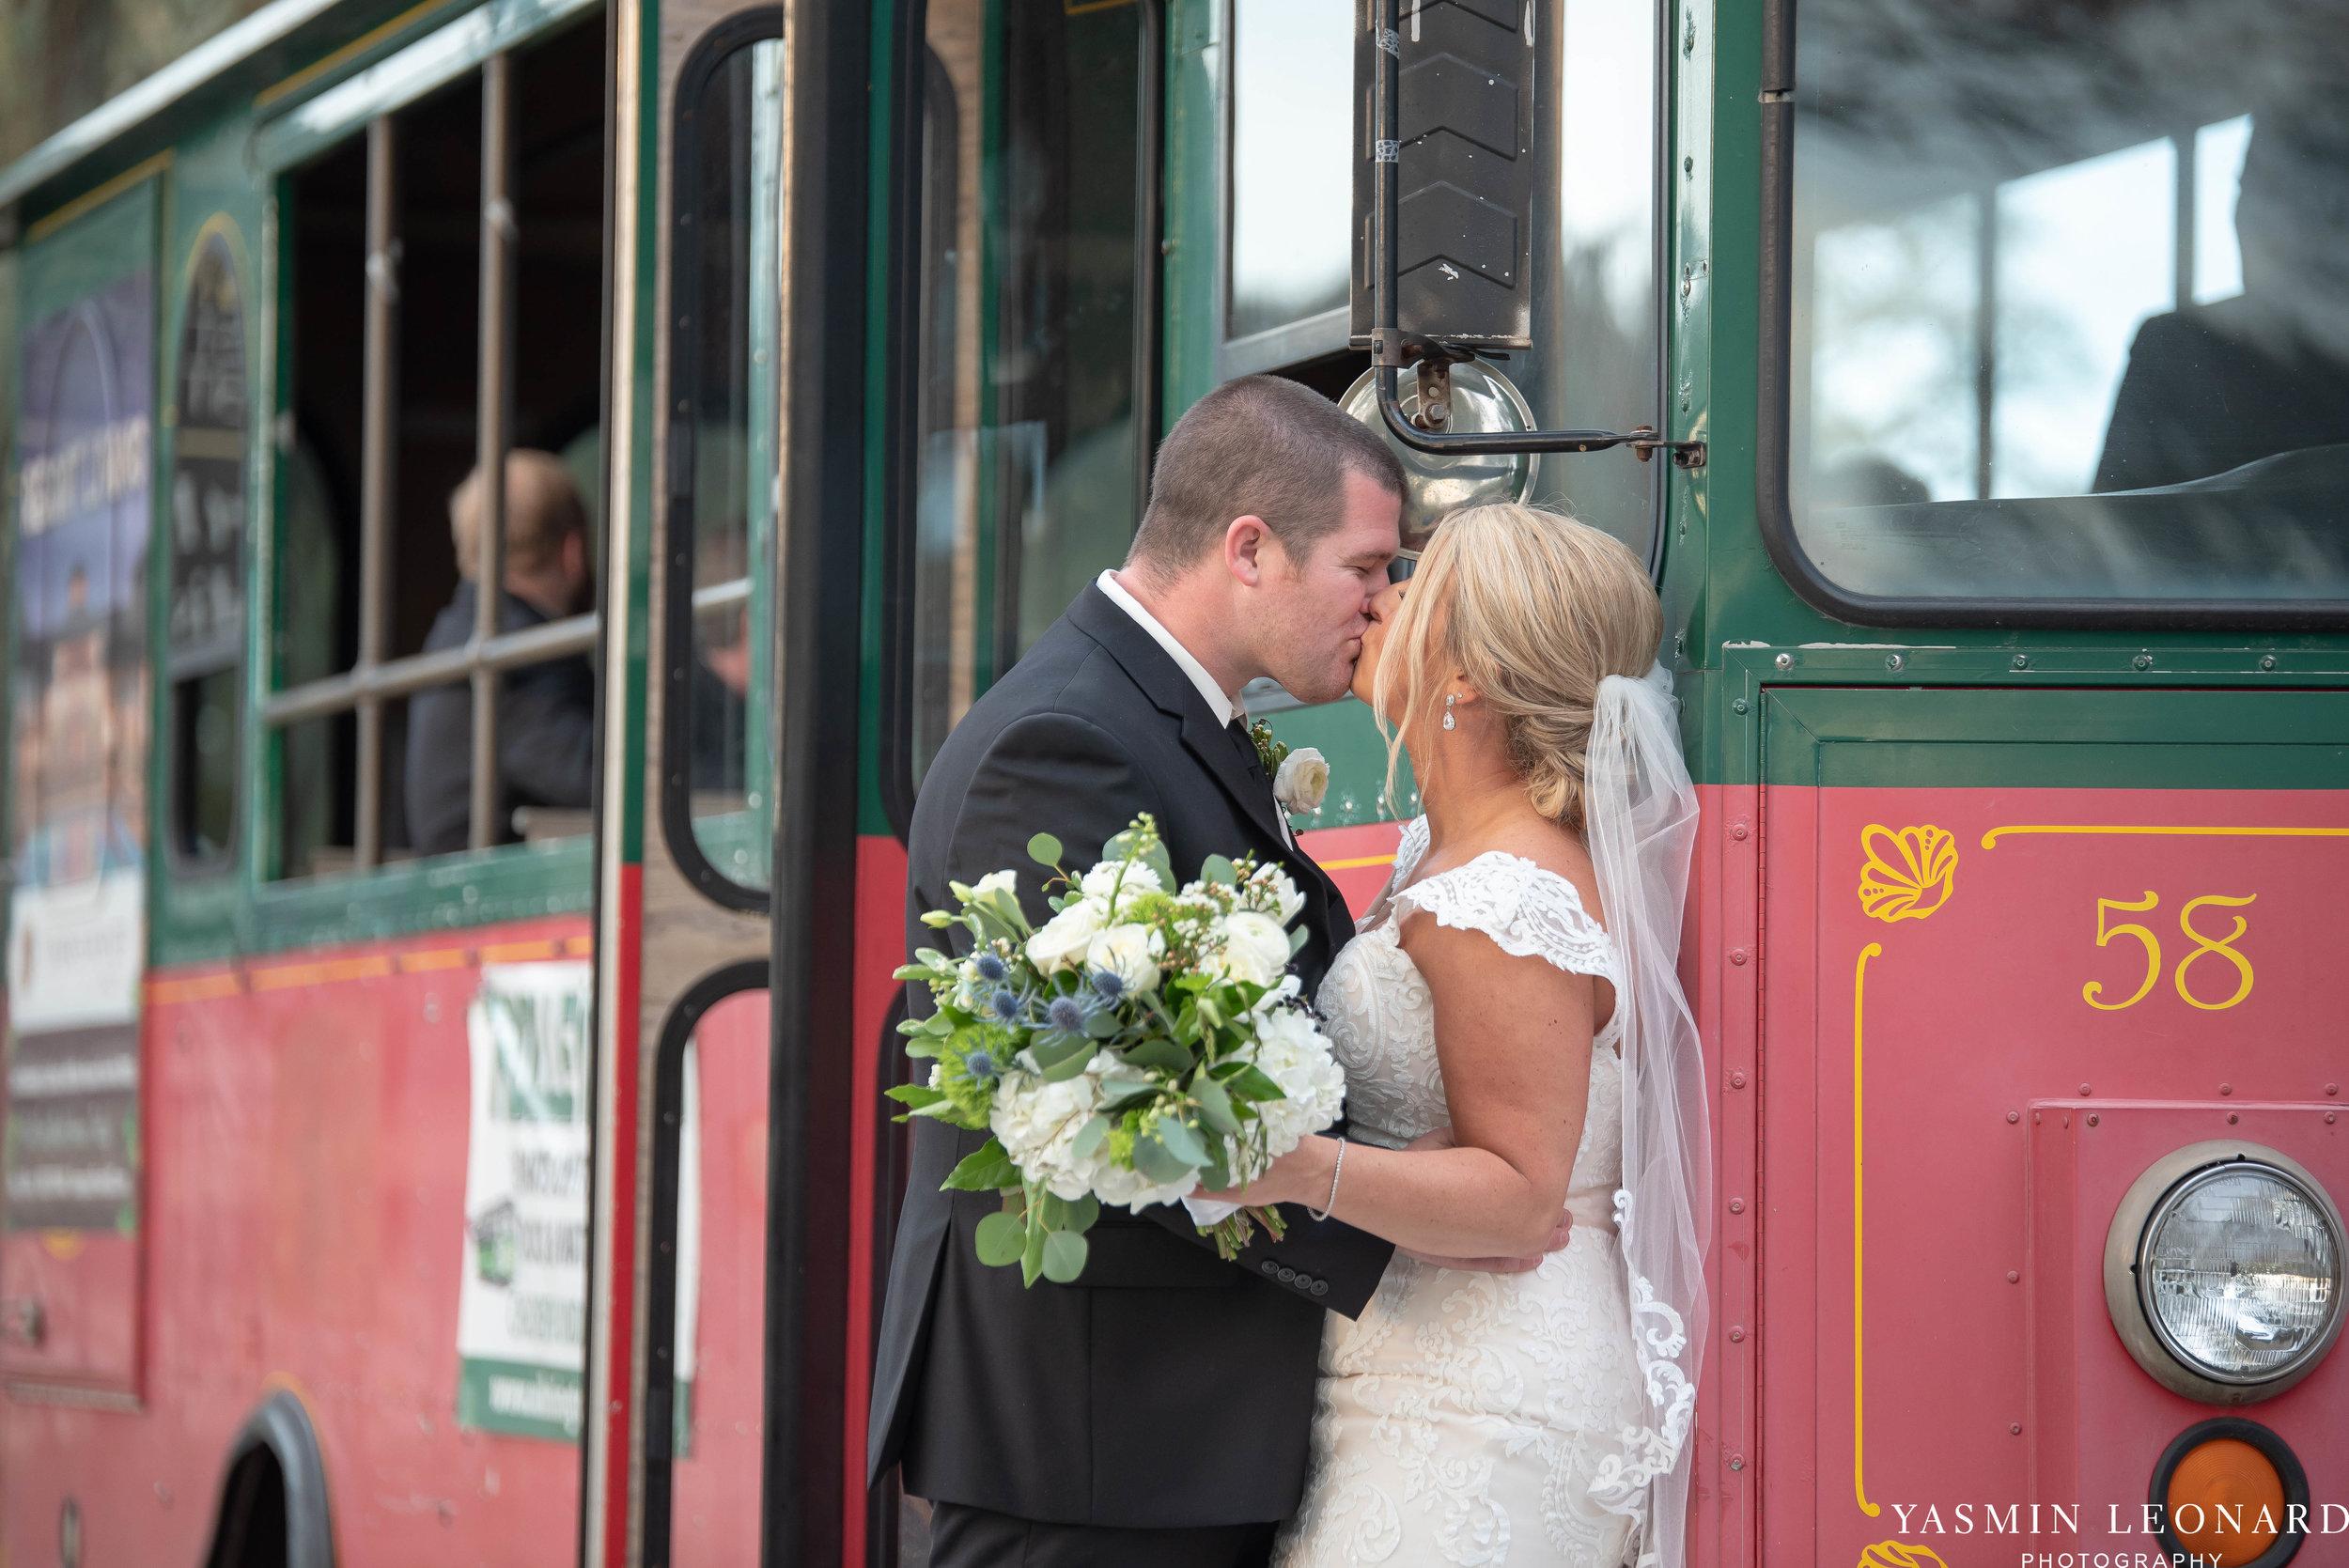 Carolina Beach Wedding - Fort Fisher Wedding - NC Acquarium - Beach Wedding - NC Wedding - Beach Wedding Inspiration - Beach Bride-39.jpg